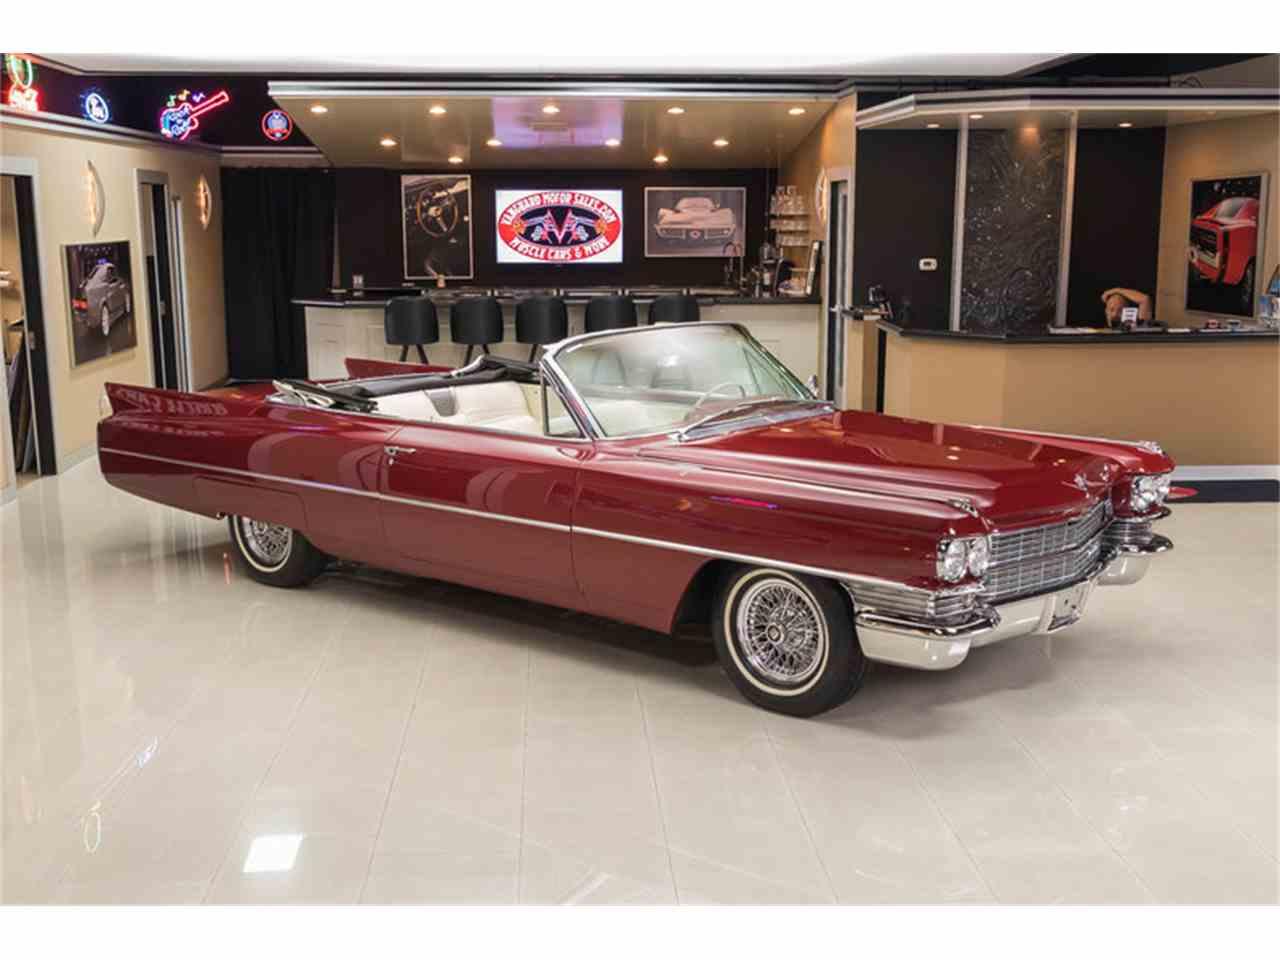 Large Picture of '63 Cadillac DeVille - $64,900.00 - LVCM